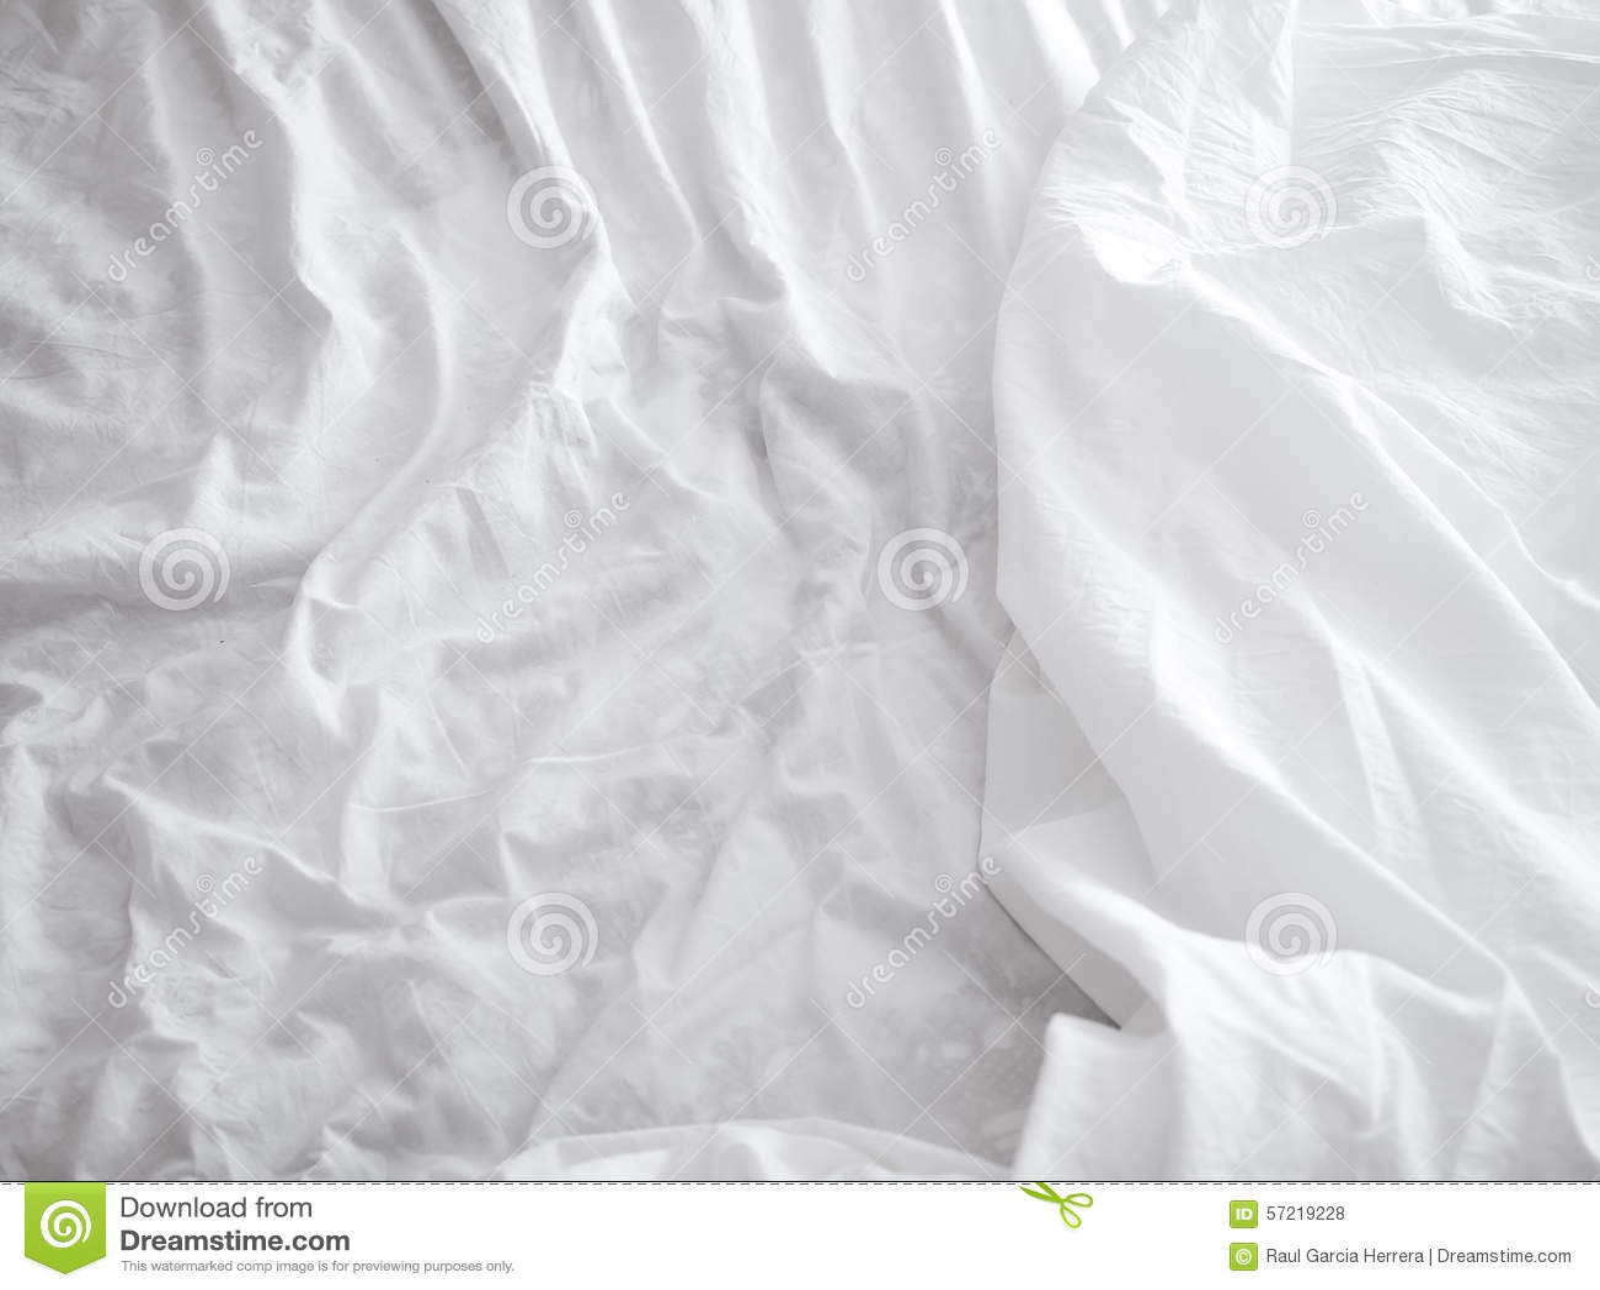 Folhas de cama brancas fundo e textura foto de stock - Ropa de cama textura ...